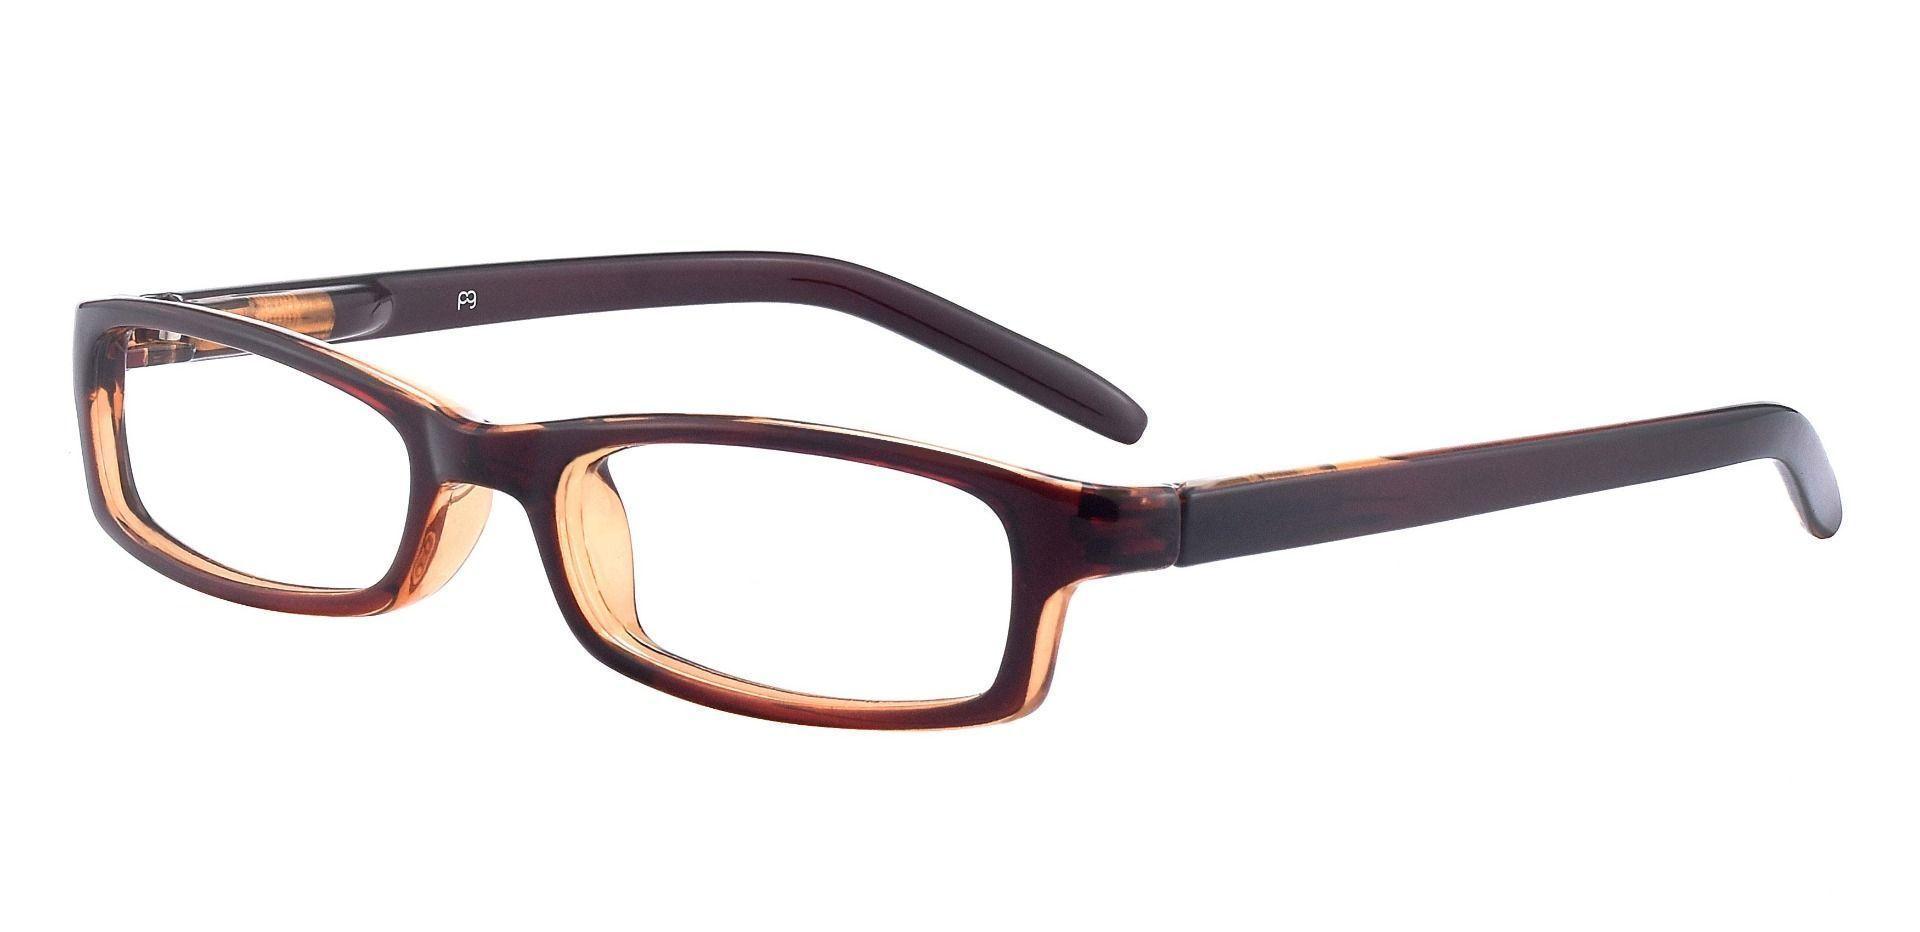 Palmer Rectangle Single Vision Glasses - Brown